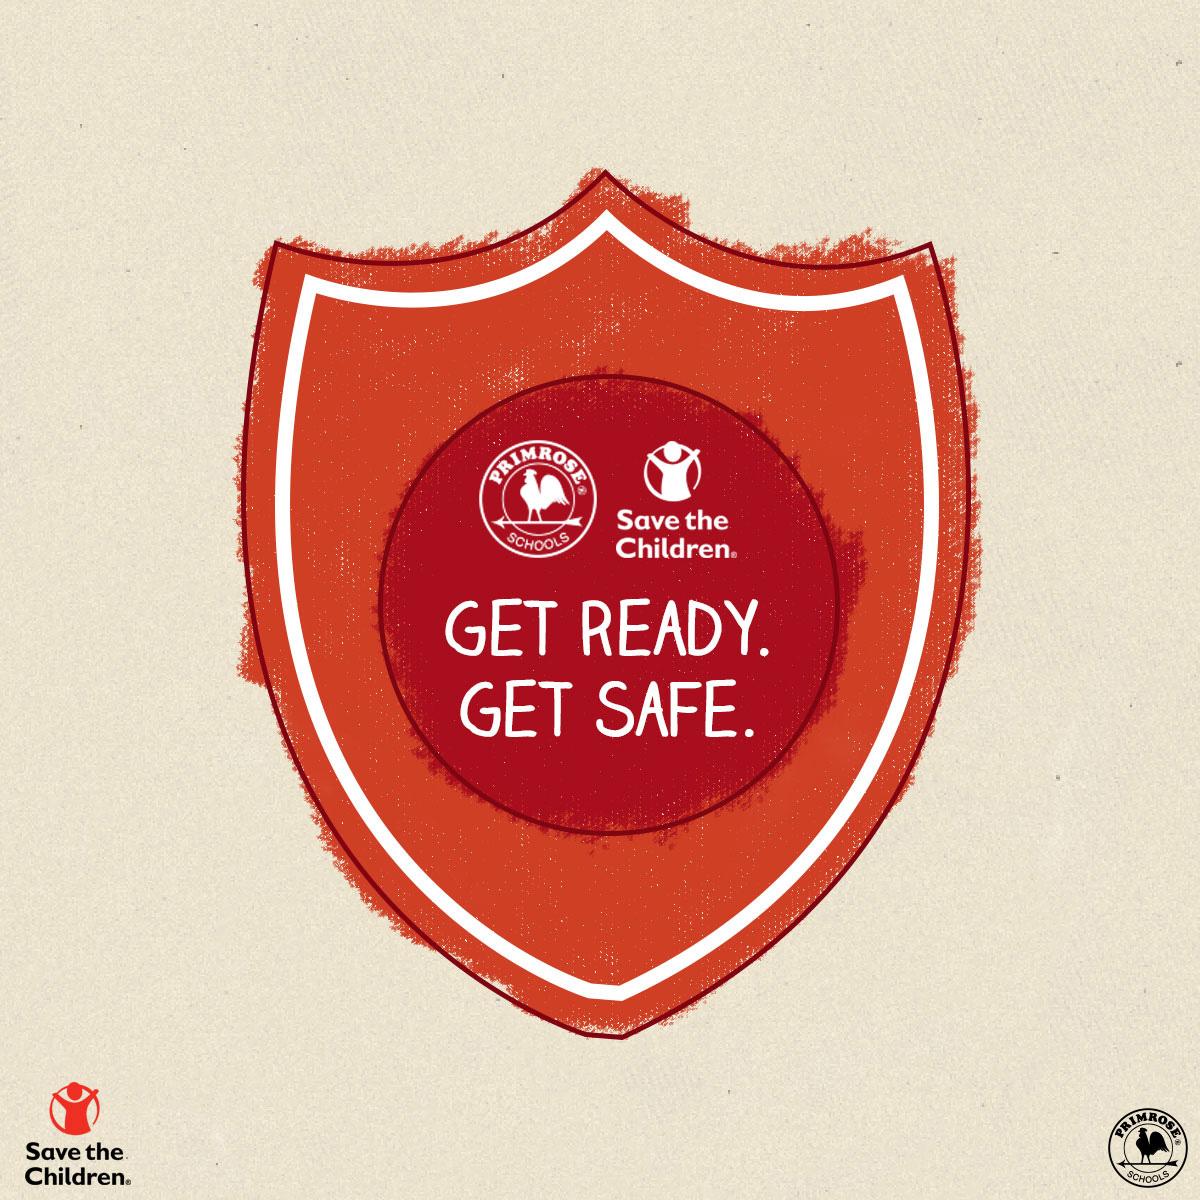 Premier Preschools Partner with Parents to Address Child Safety